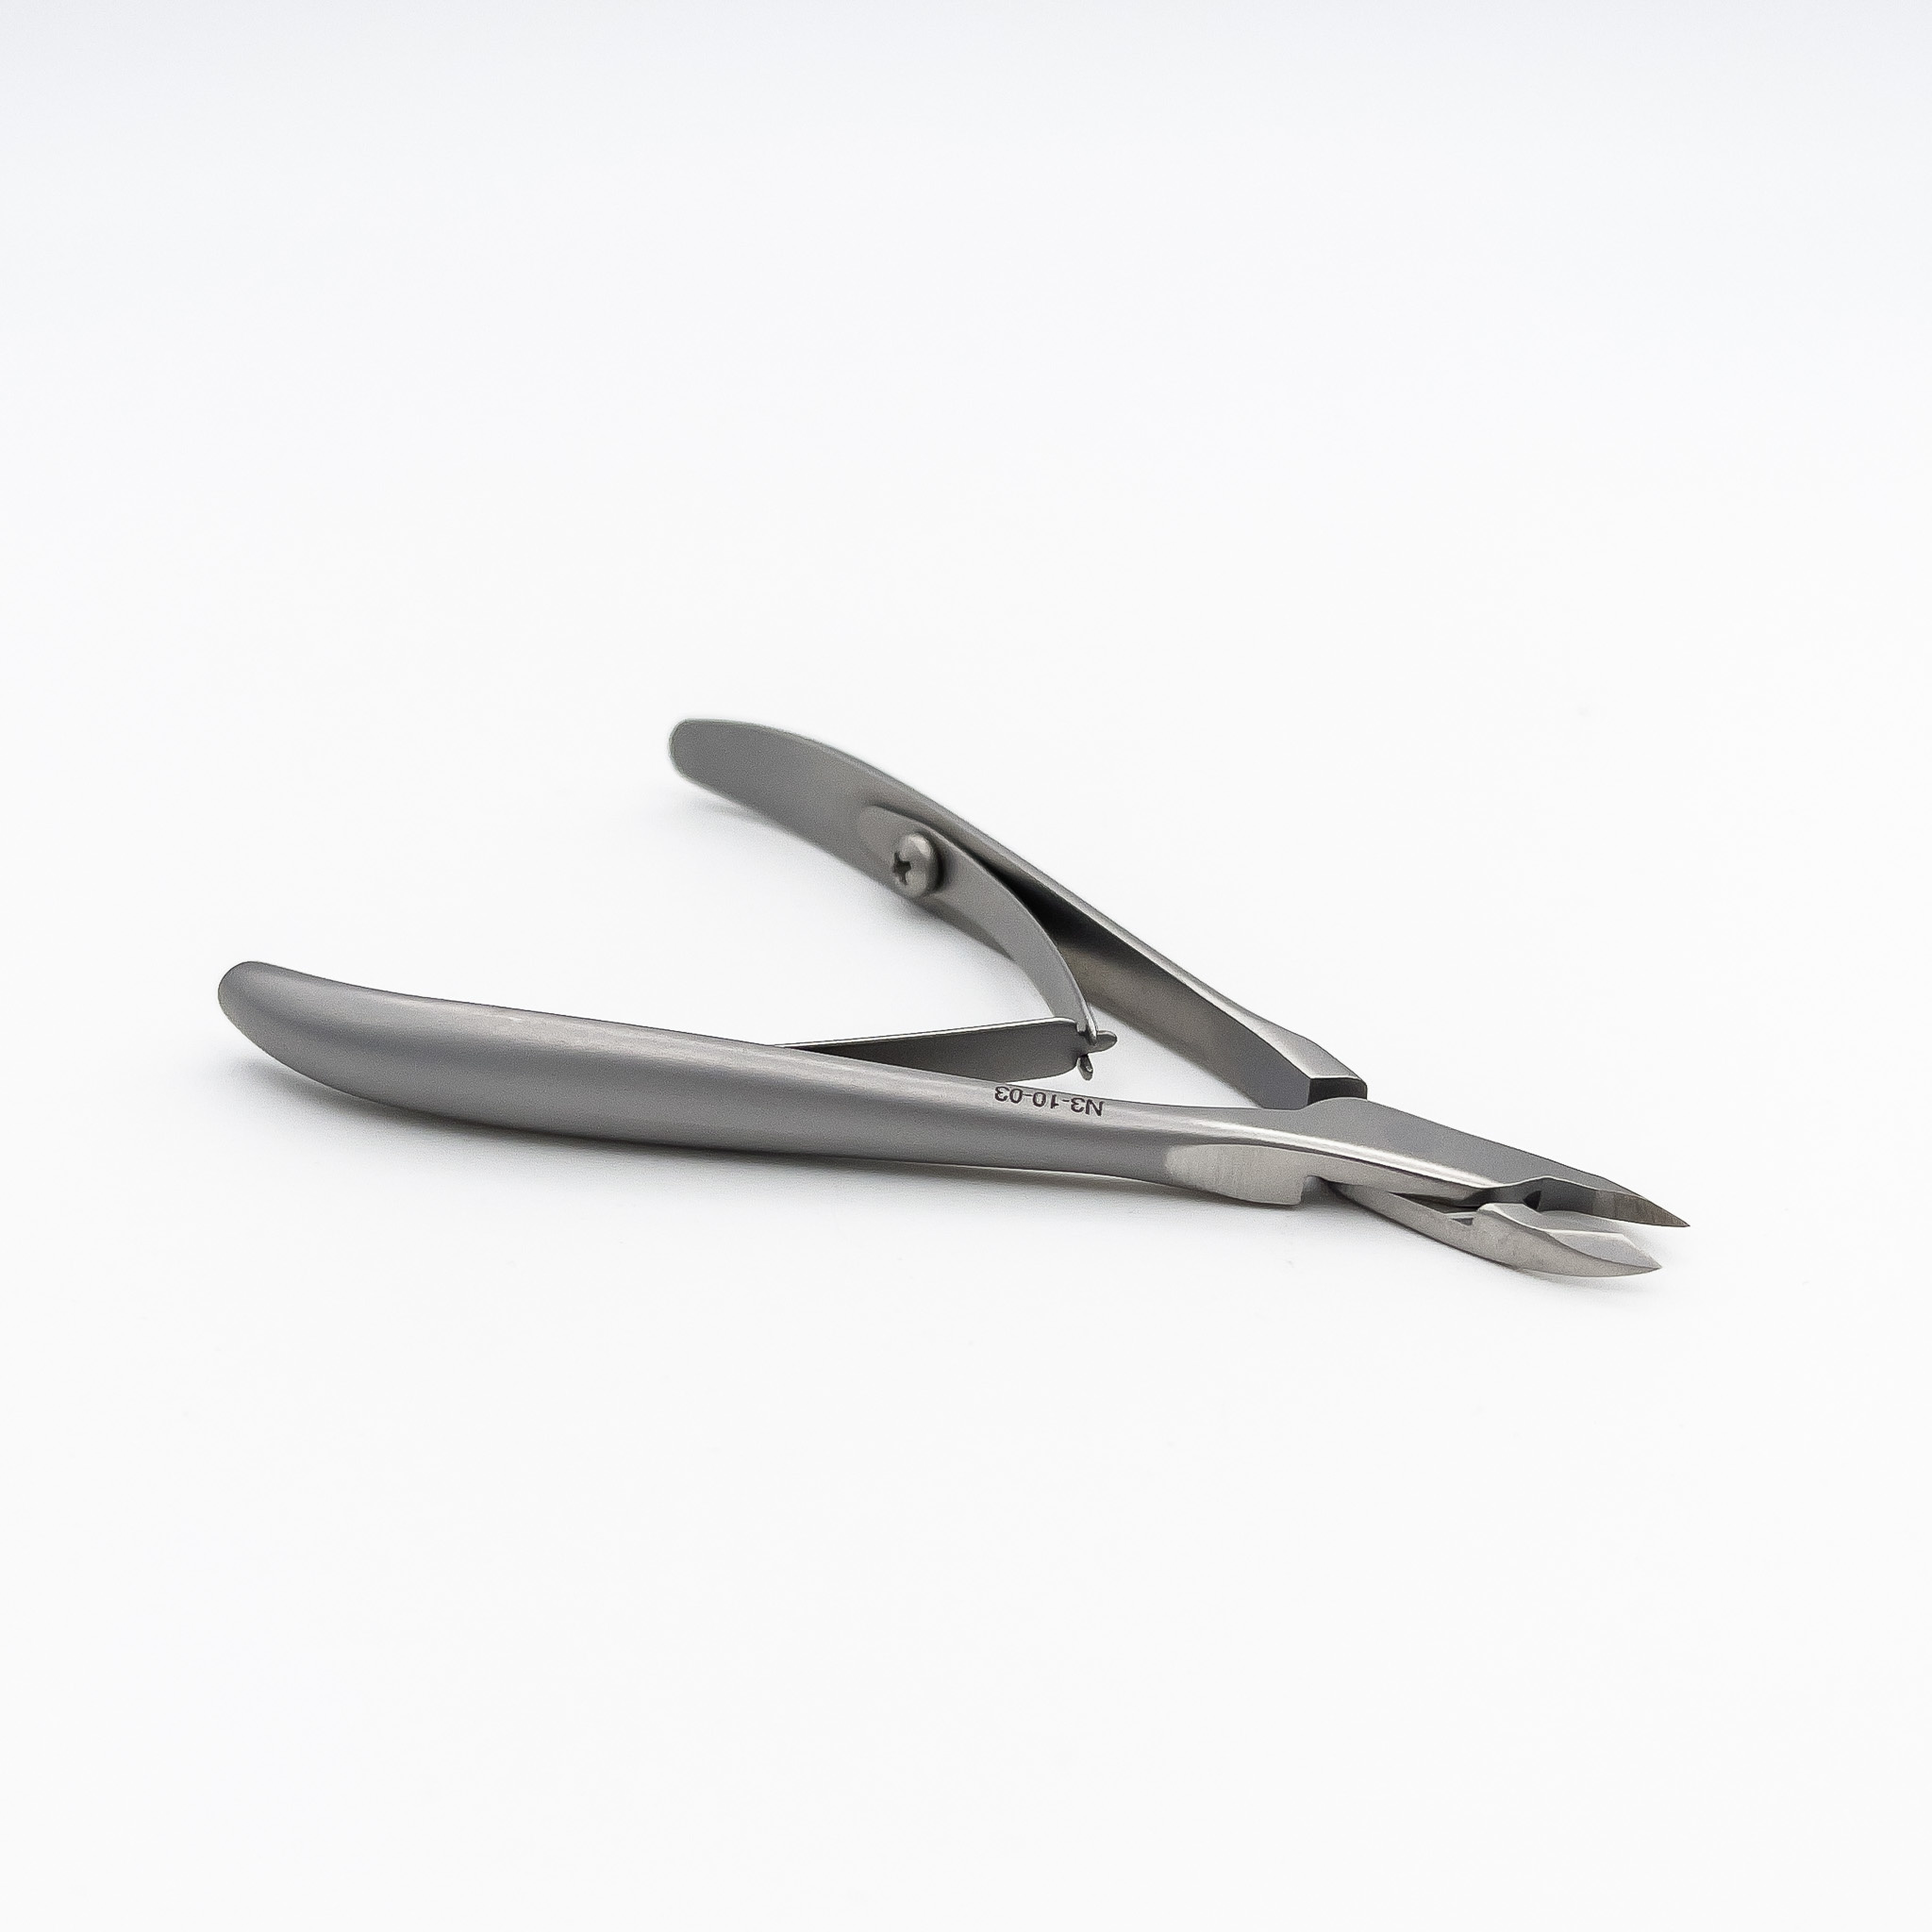 STALENA Vellentang 3 mm - korte handgreep KM-003 (N3-10-03)